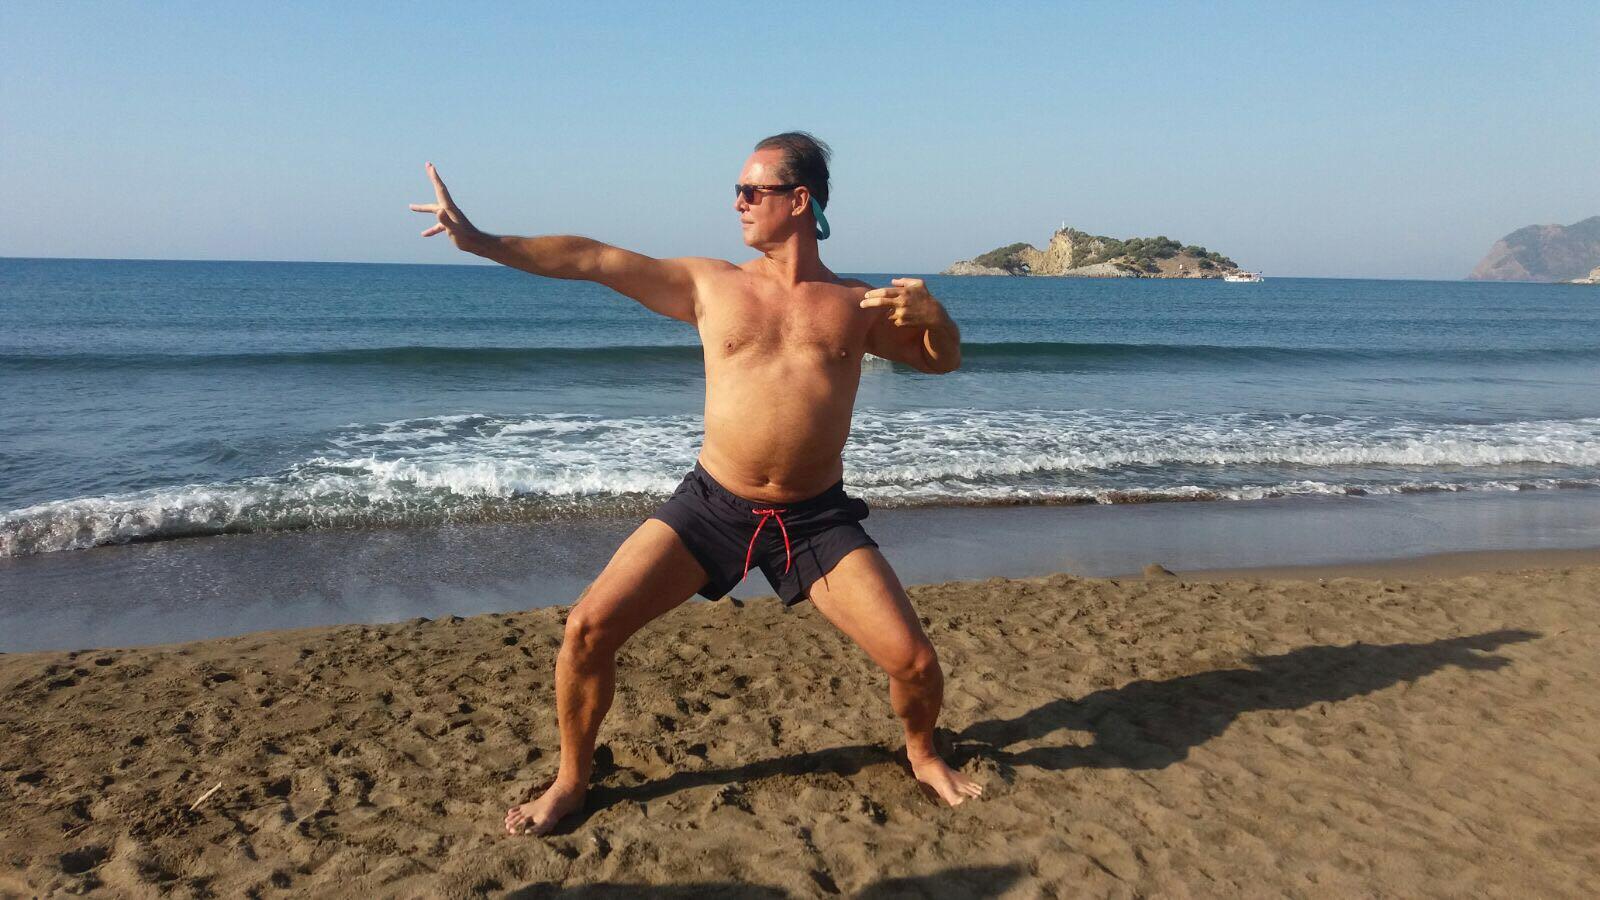 Yoga en Mindfulness Wellness en Detox Retraite in Turkije 2017